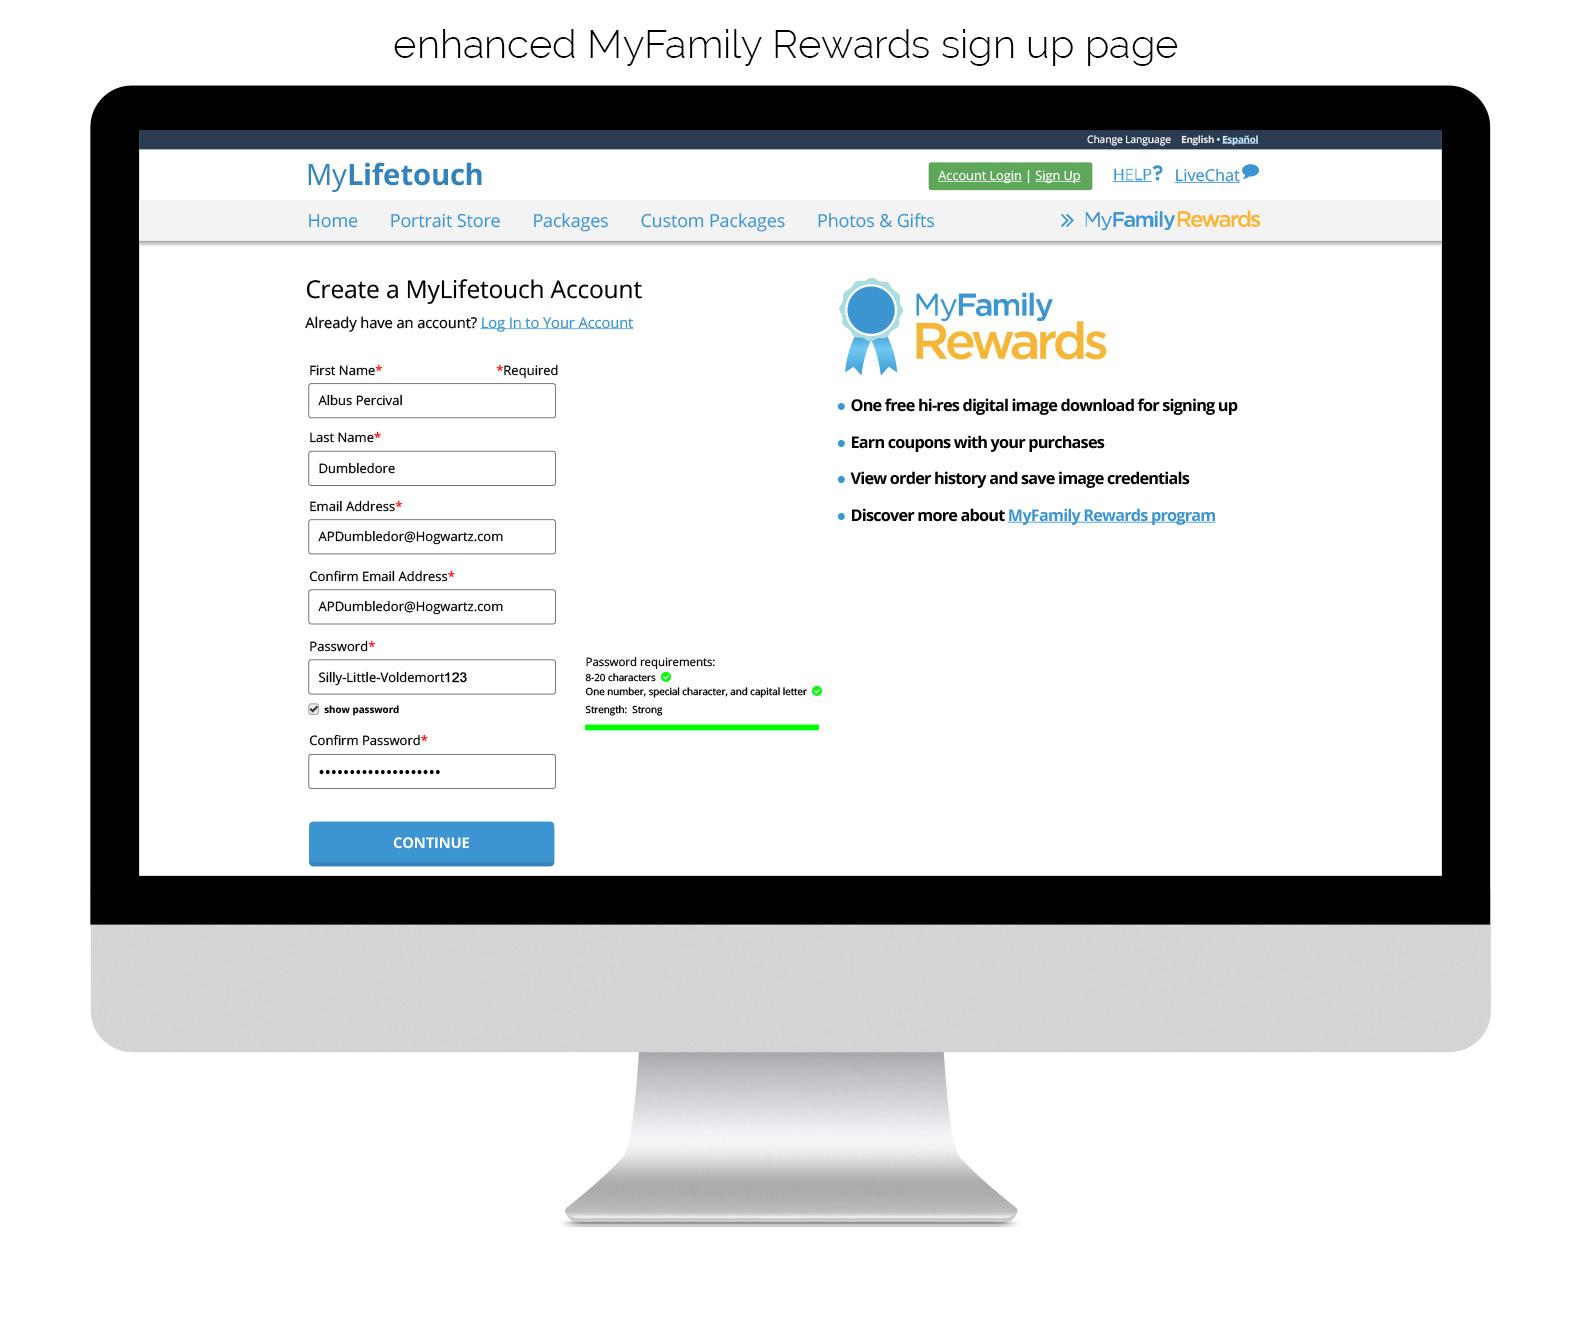 Rewards - Sign Up Page